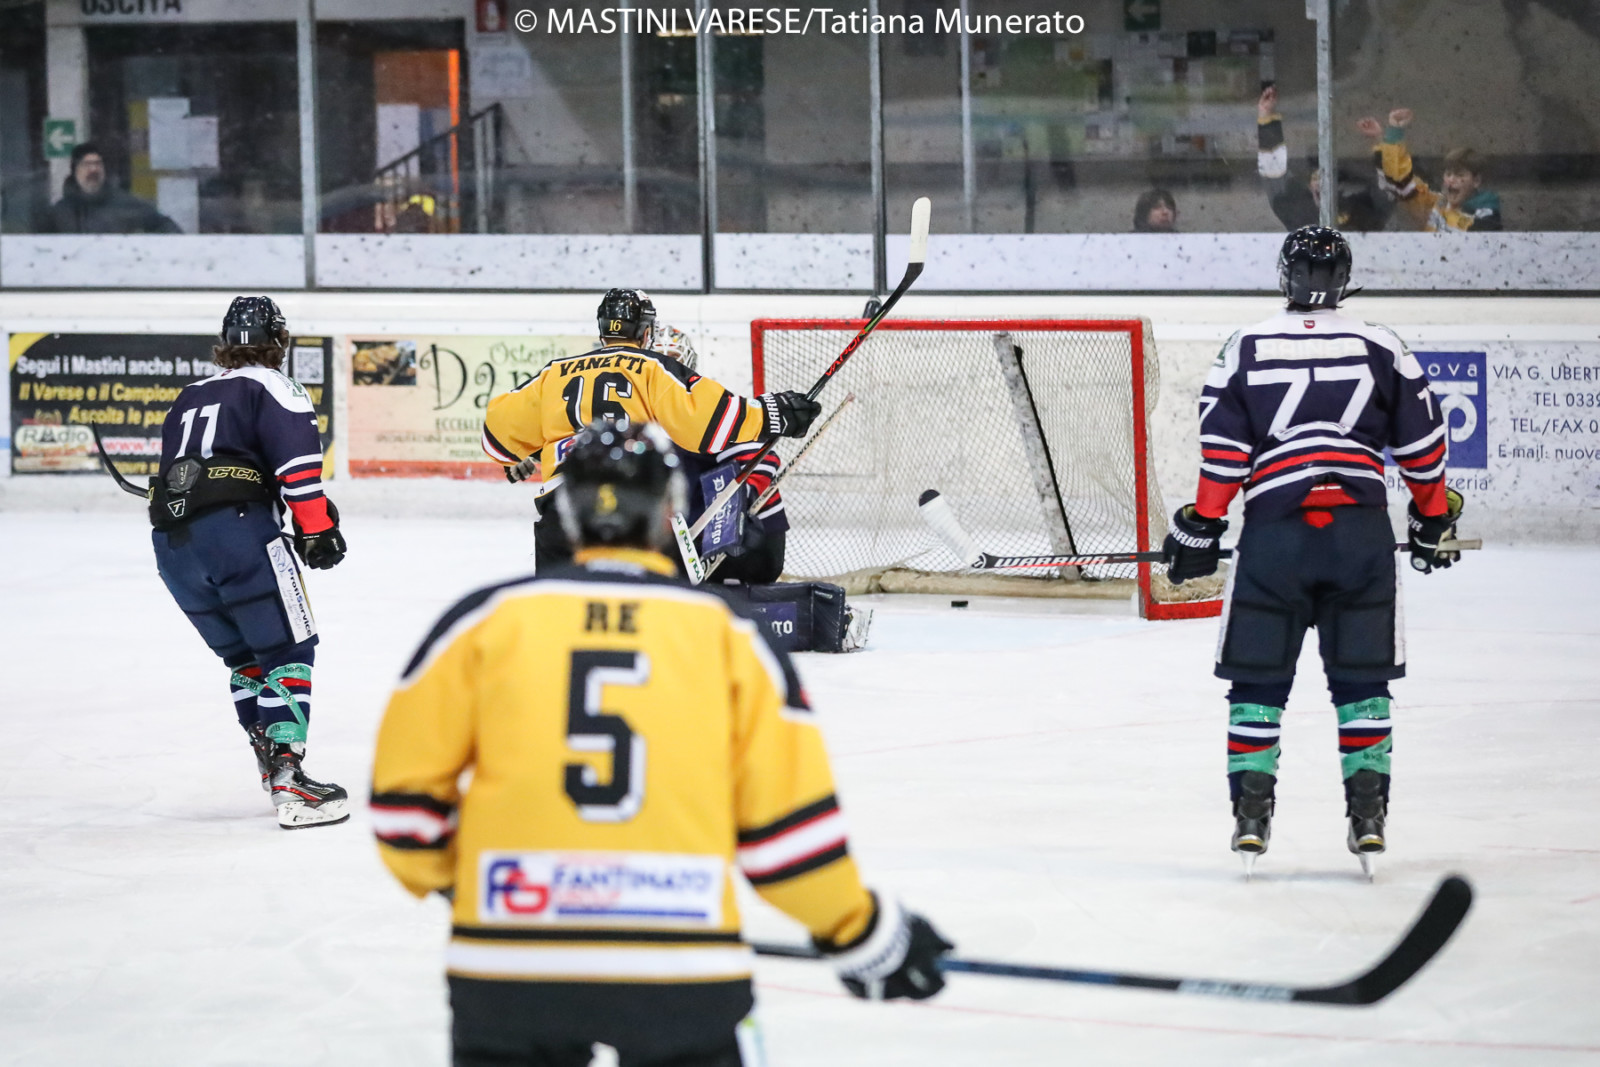 Mastini di Varese hockey